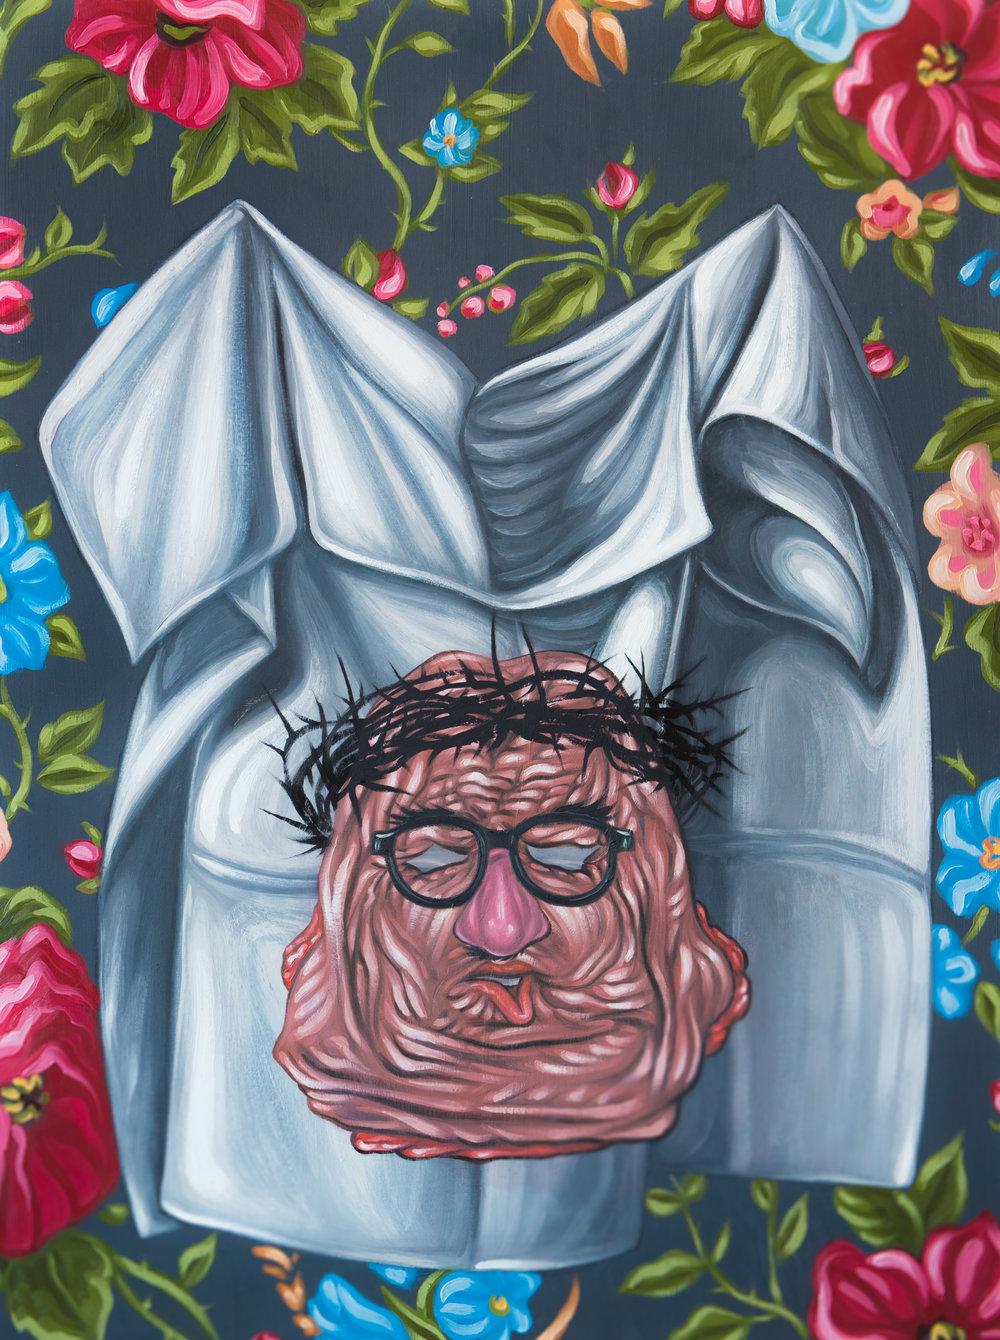 Drew Simpson, The Shroud of Skullduggery, 2019, oil on panel, 24 x 18 inches